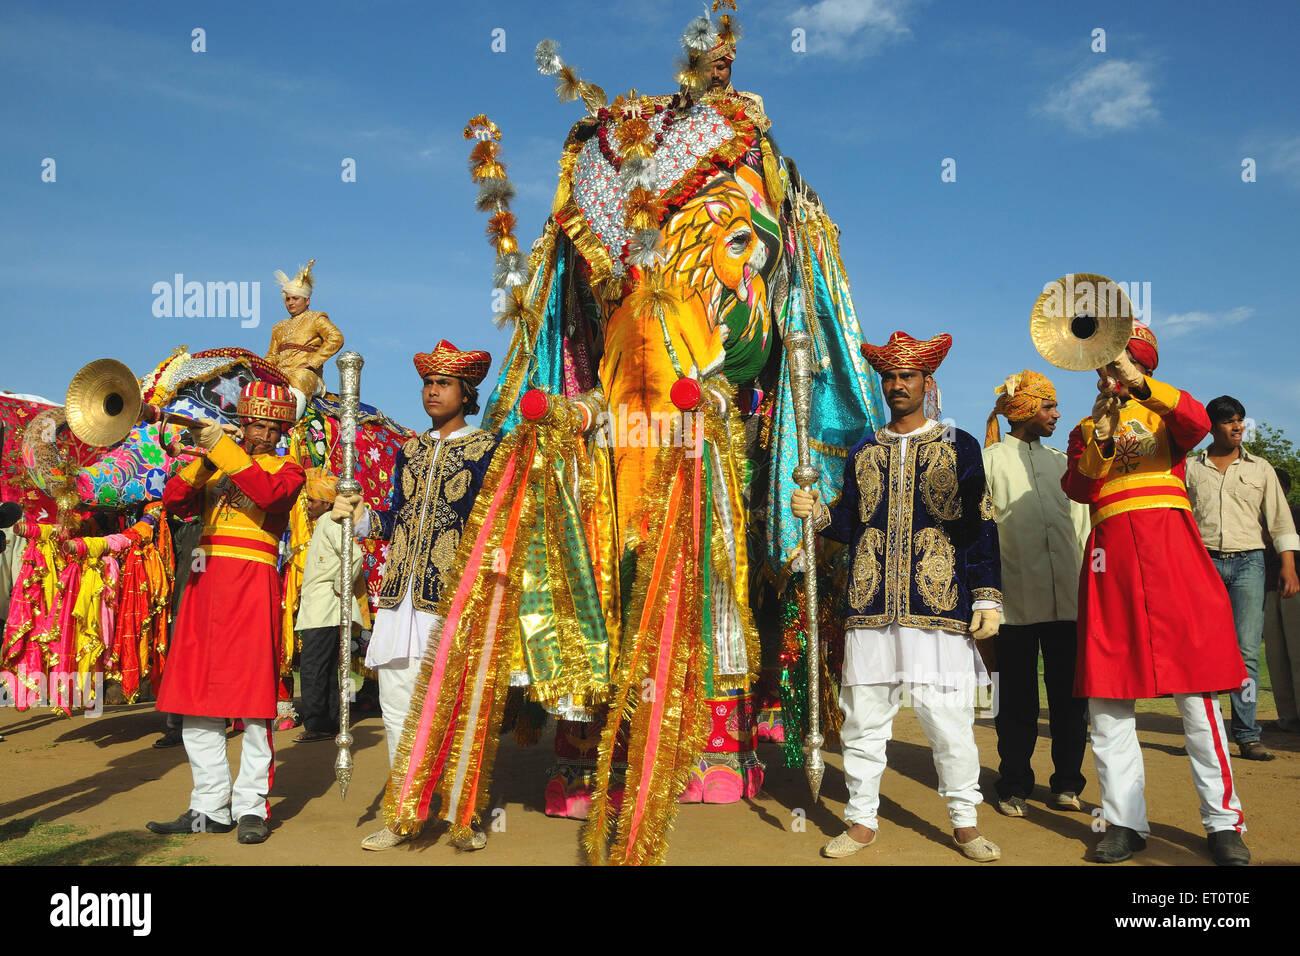 Dipinto e decorato elefanti ; Jaipur ; Rajasthan ; India Immagini Stock